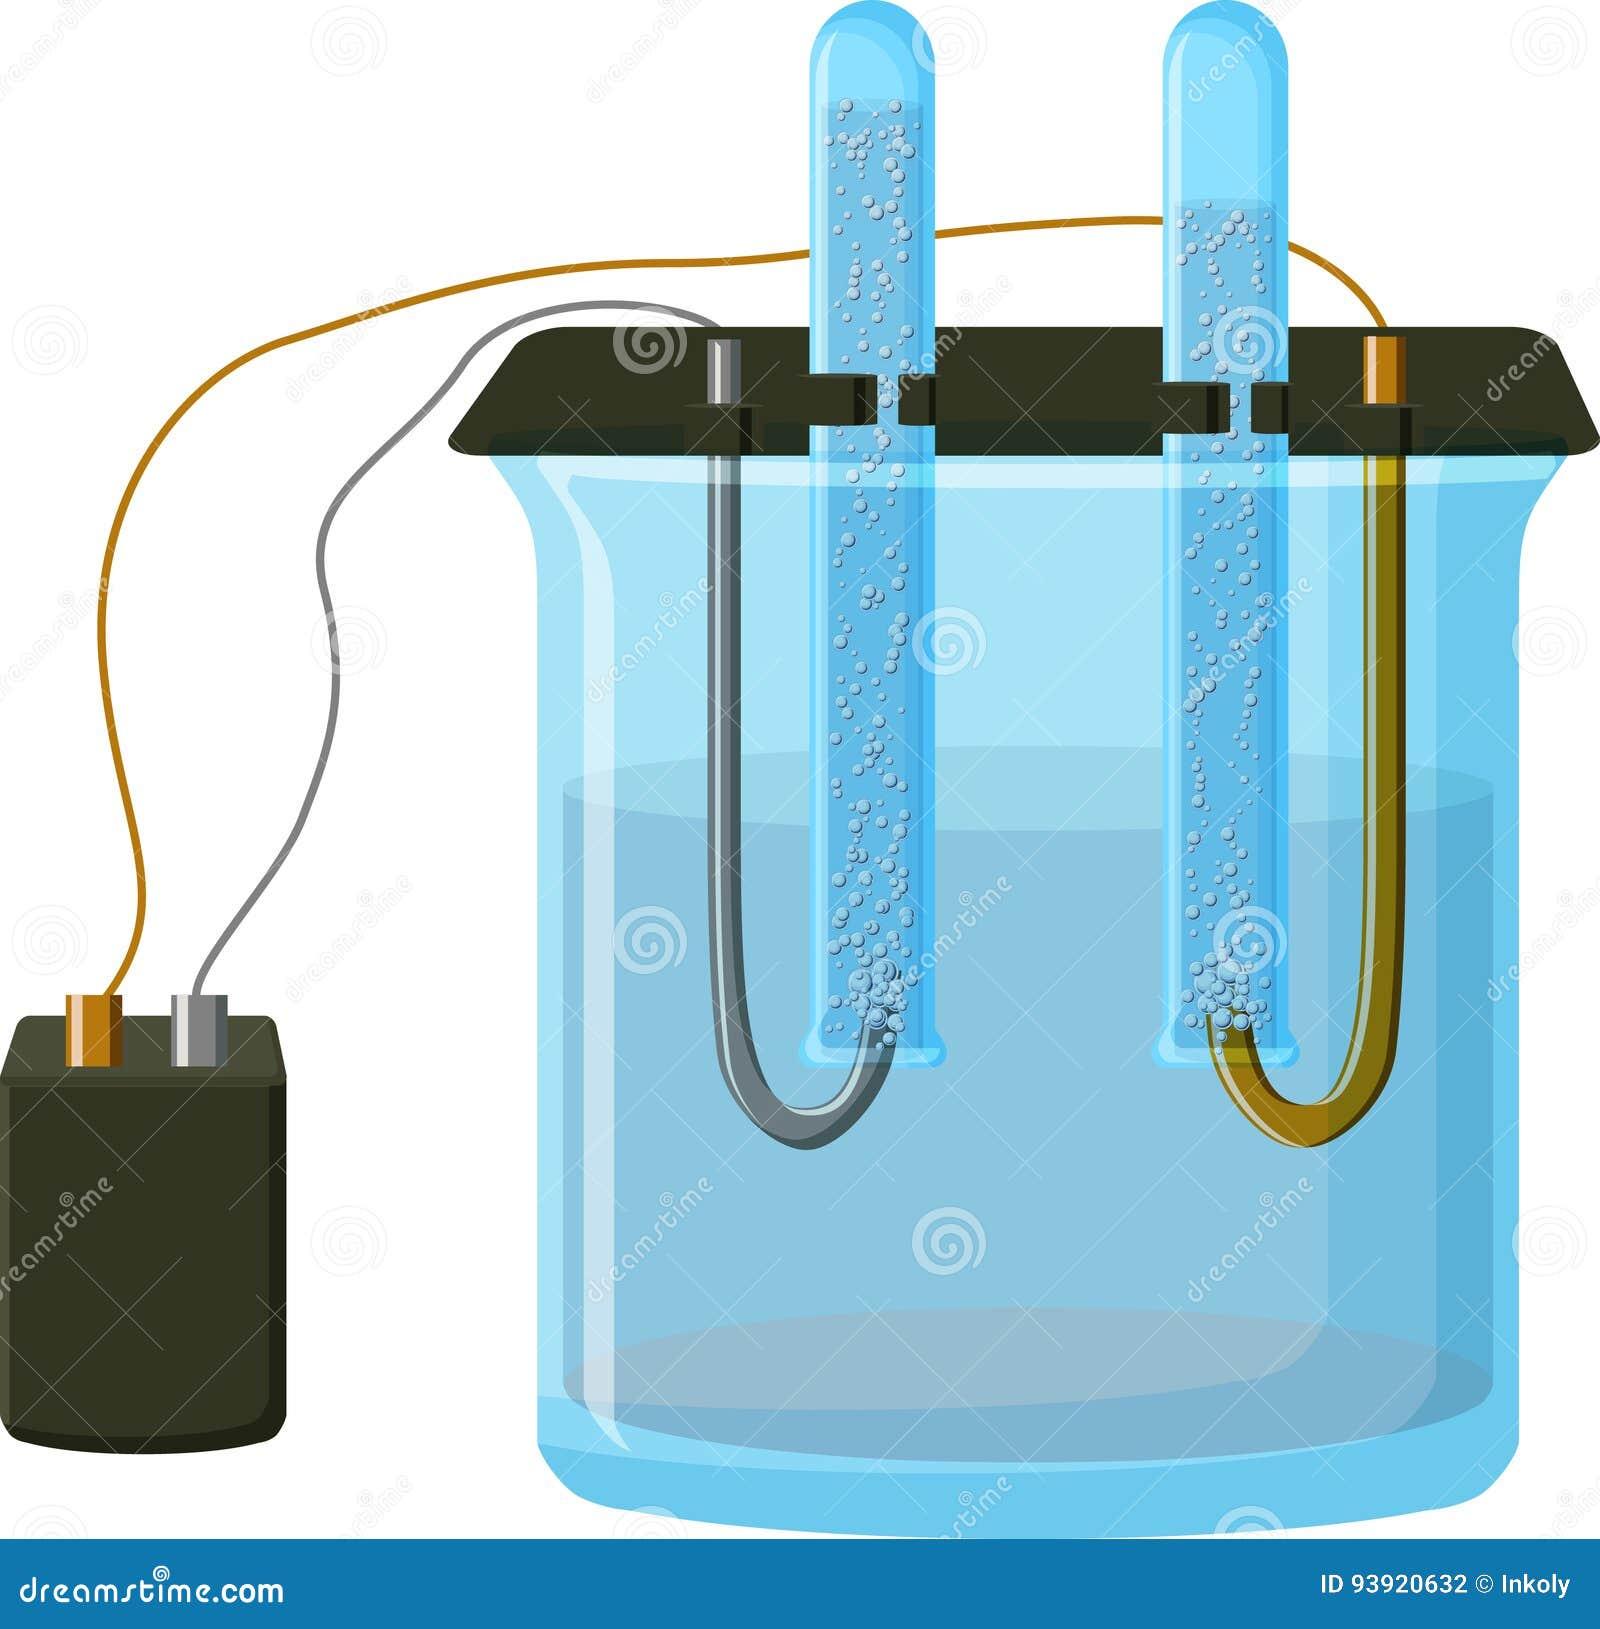 Electrolysis Cartoons  Illustrations  U0026 Vector Stock Images